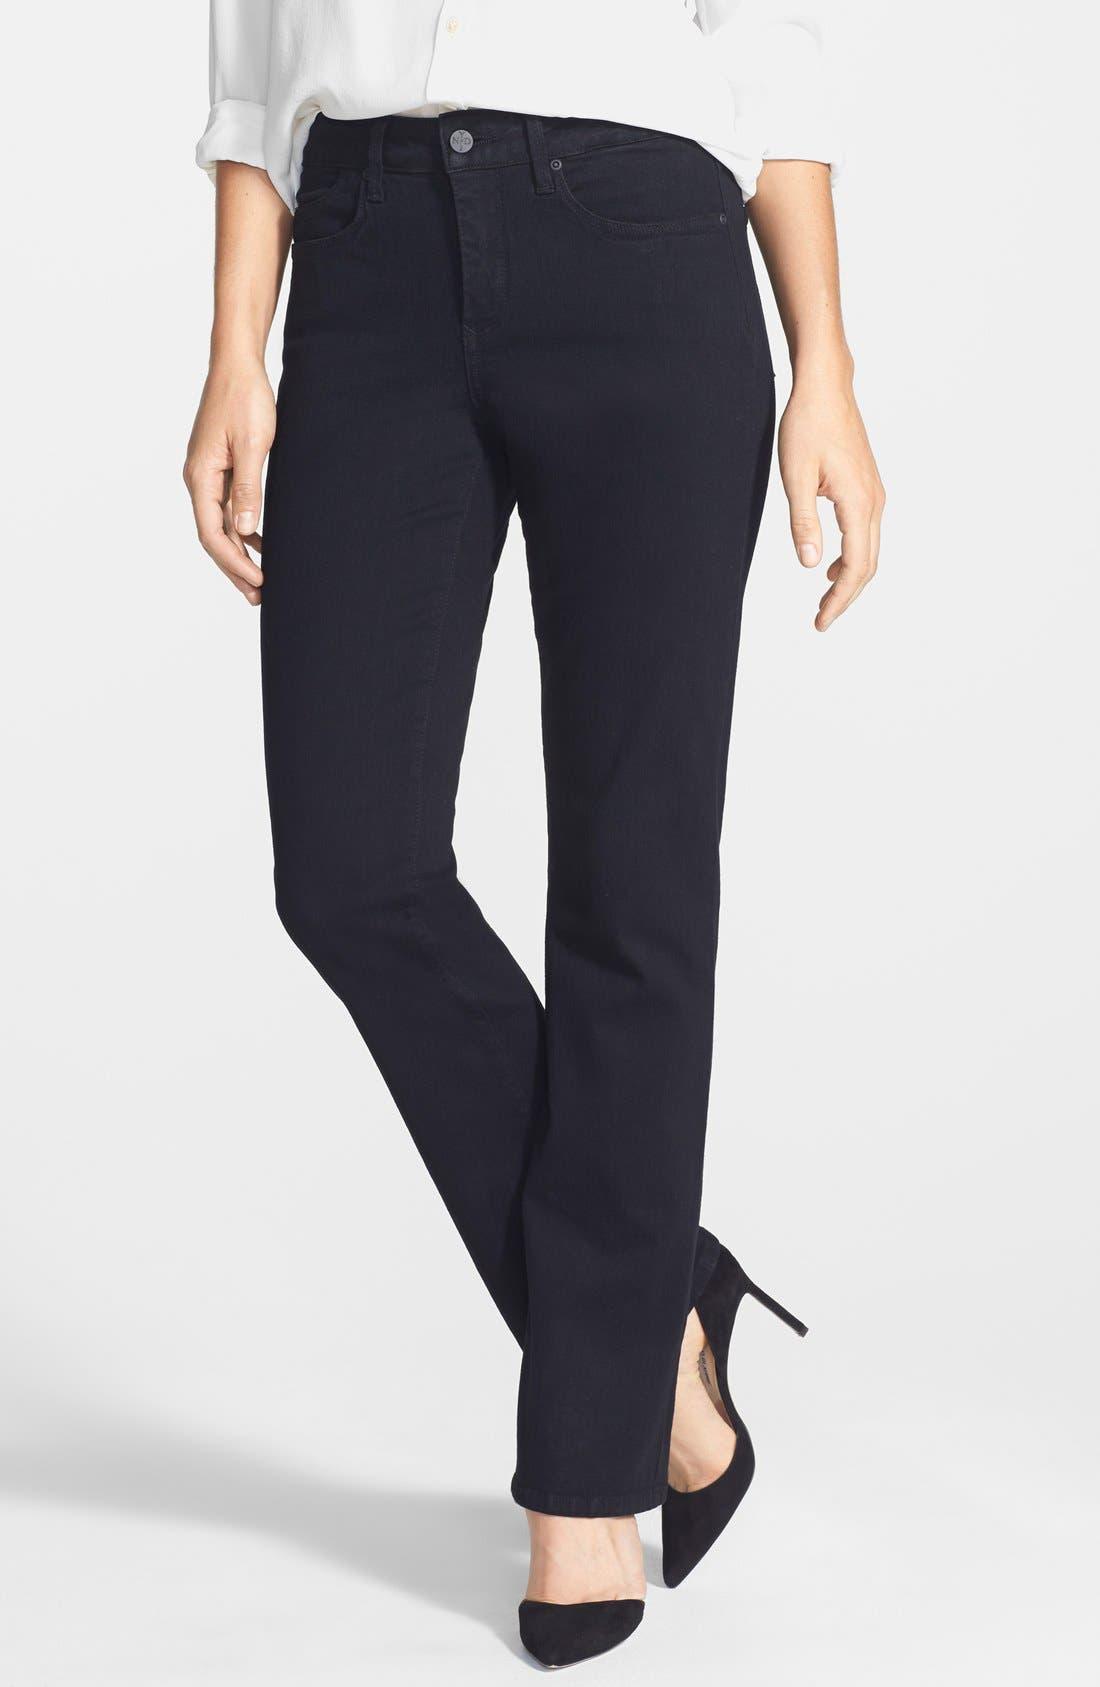 NYDJ 'Billie' Stretch Mini Bootcut Jeans, Main, color, BLACK